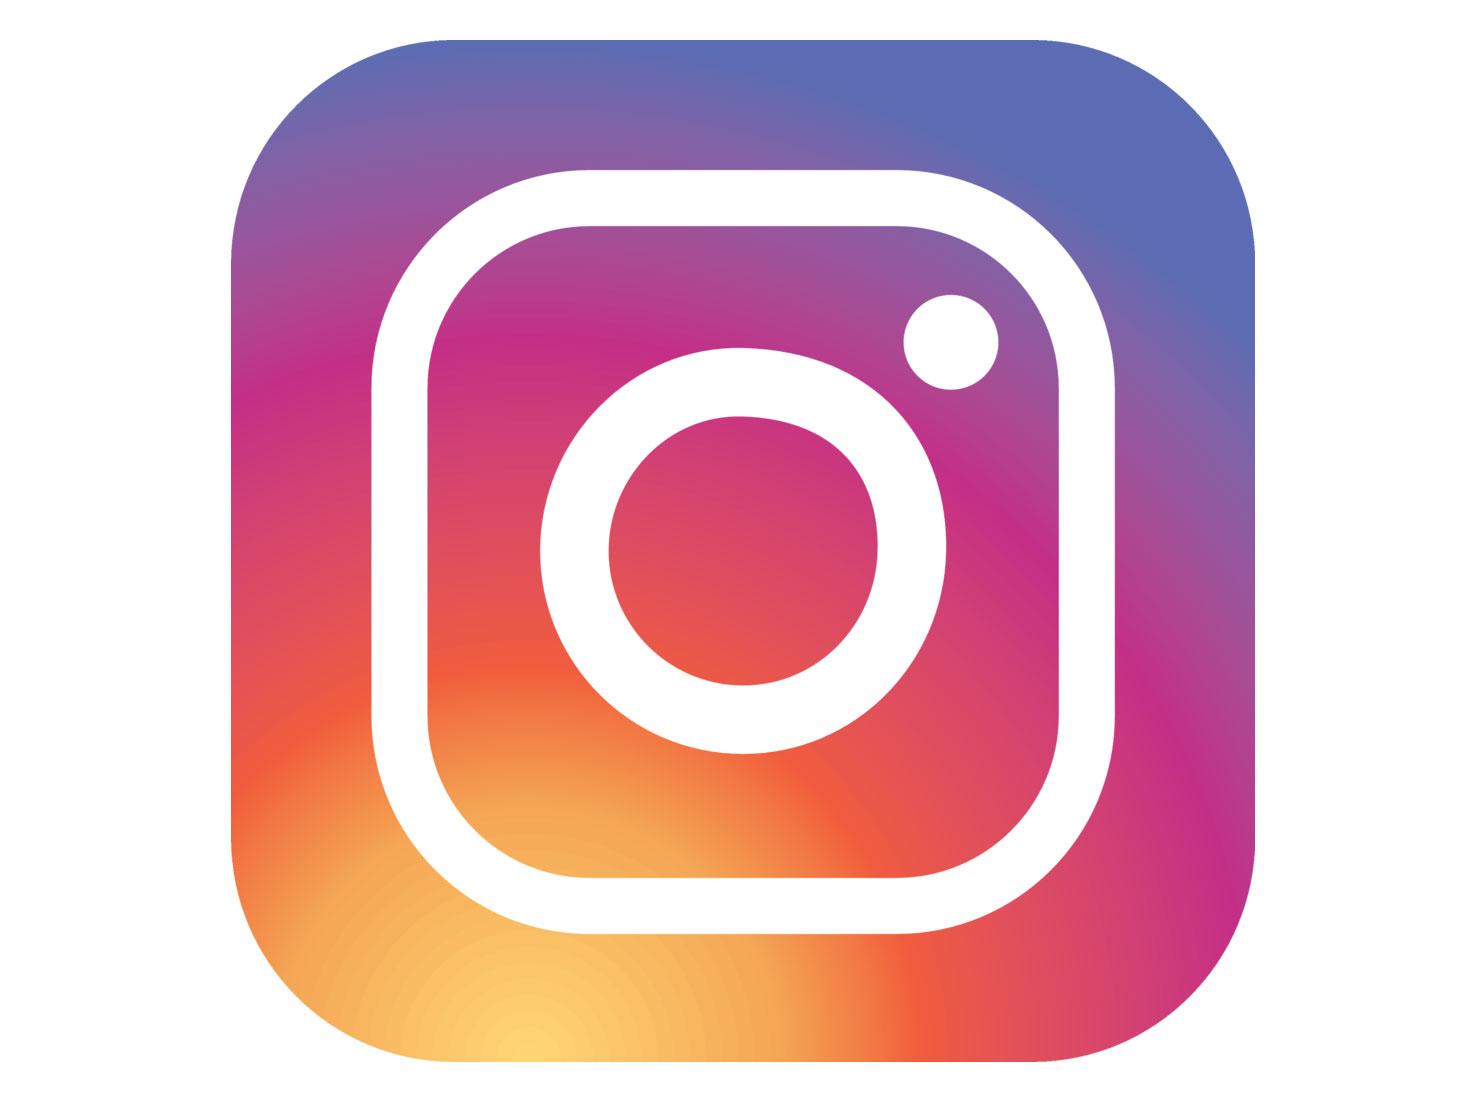 1473x1105 Instagram Implements Image Upload Through Mobile Site Digital